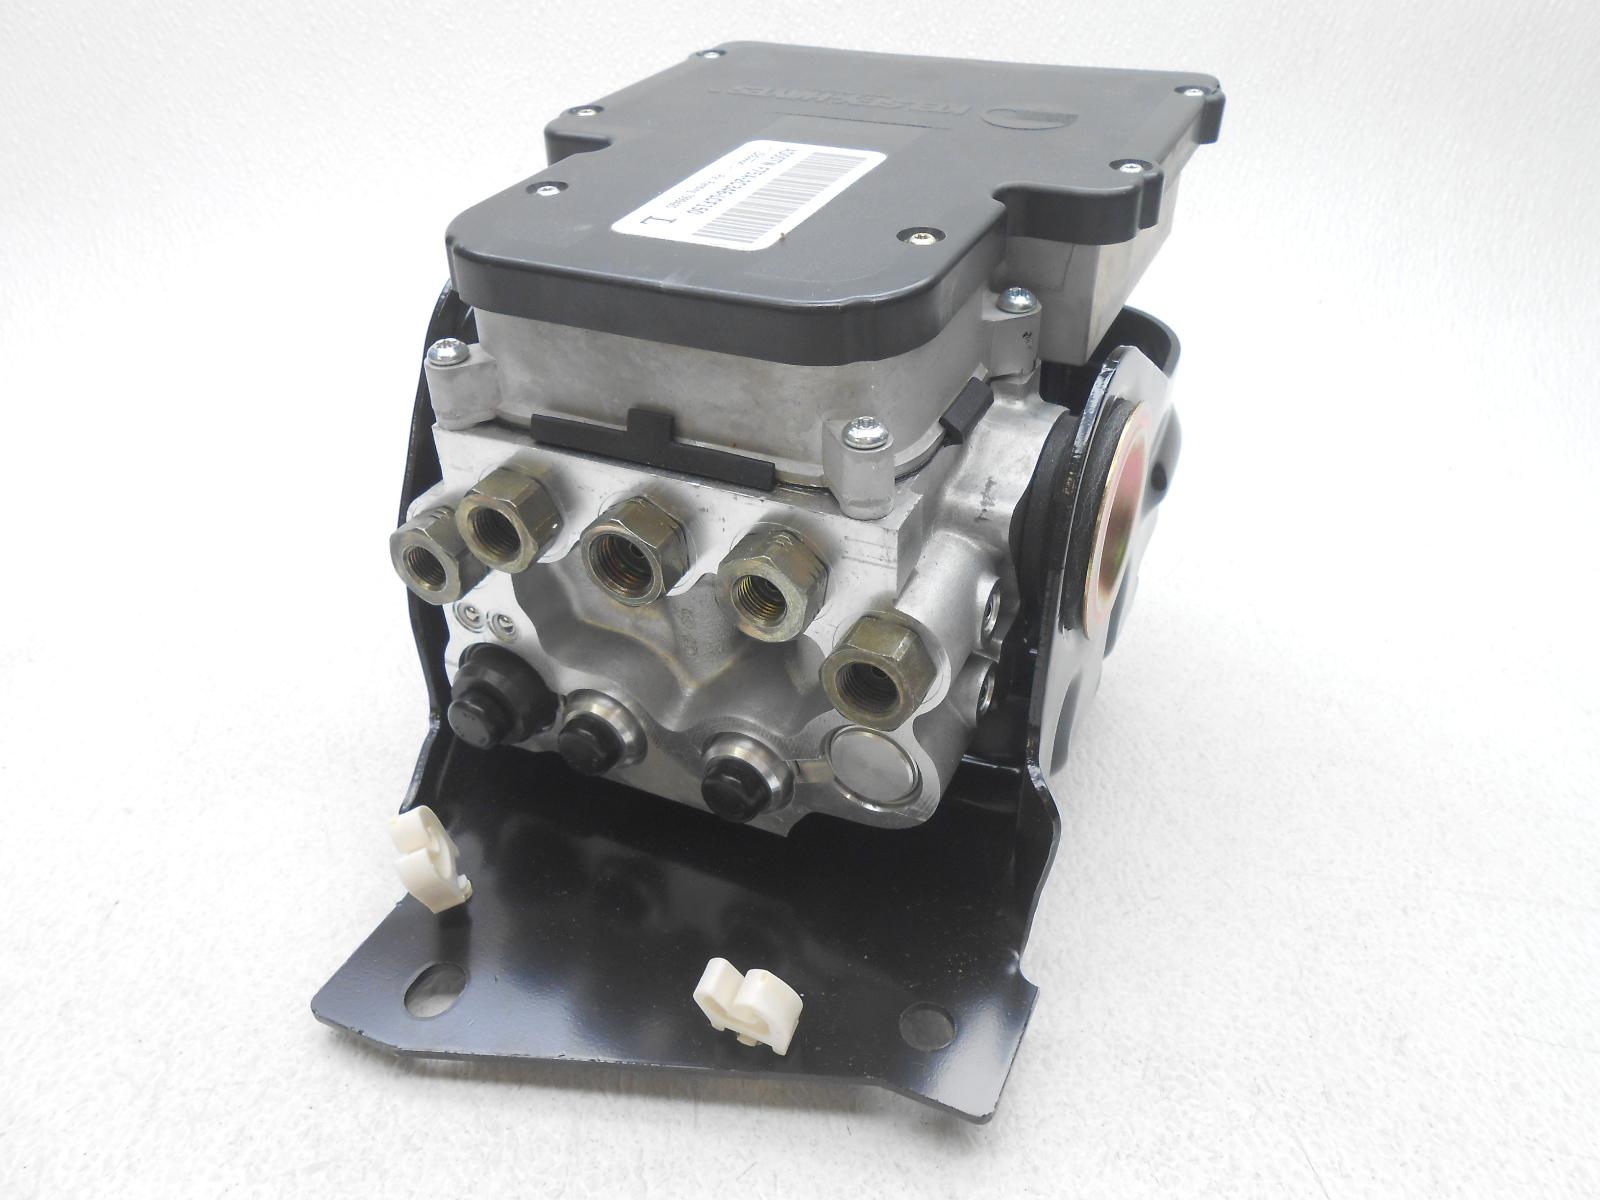 1997 Ford F 150 Abs Modulator – Wonderful Image Gallery